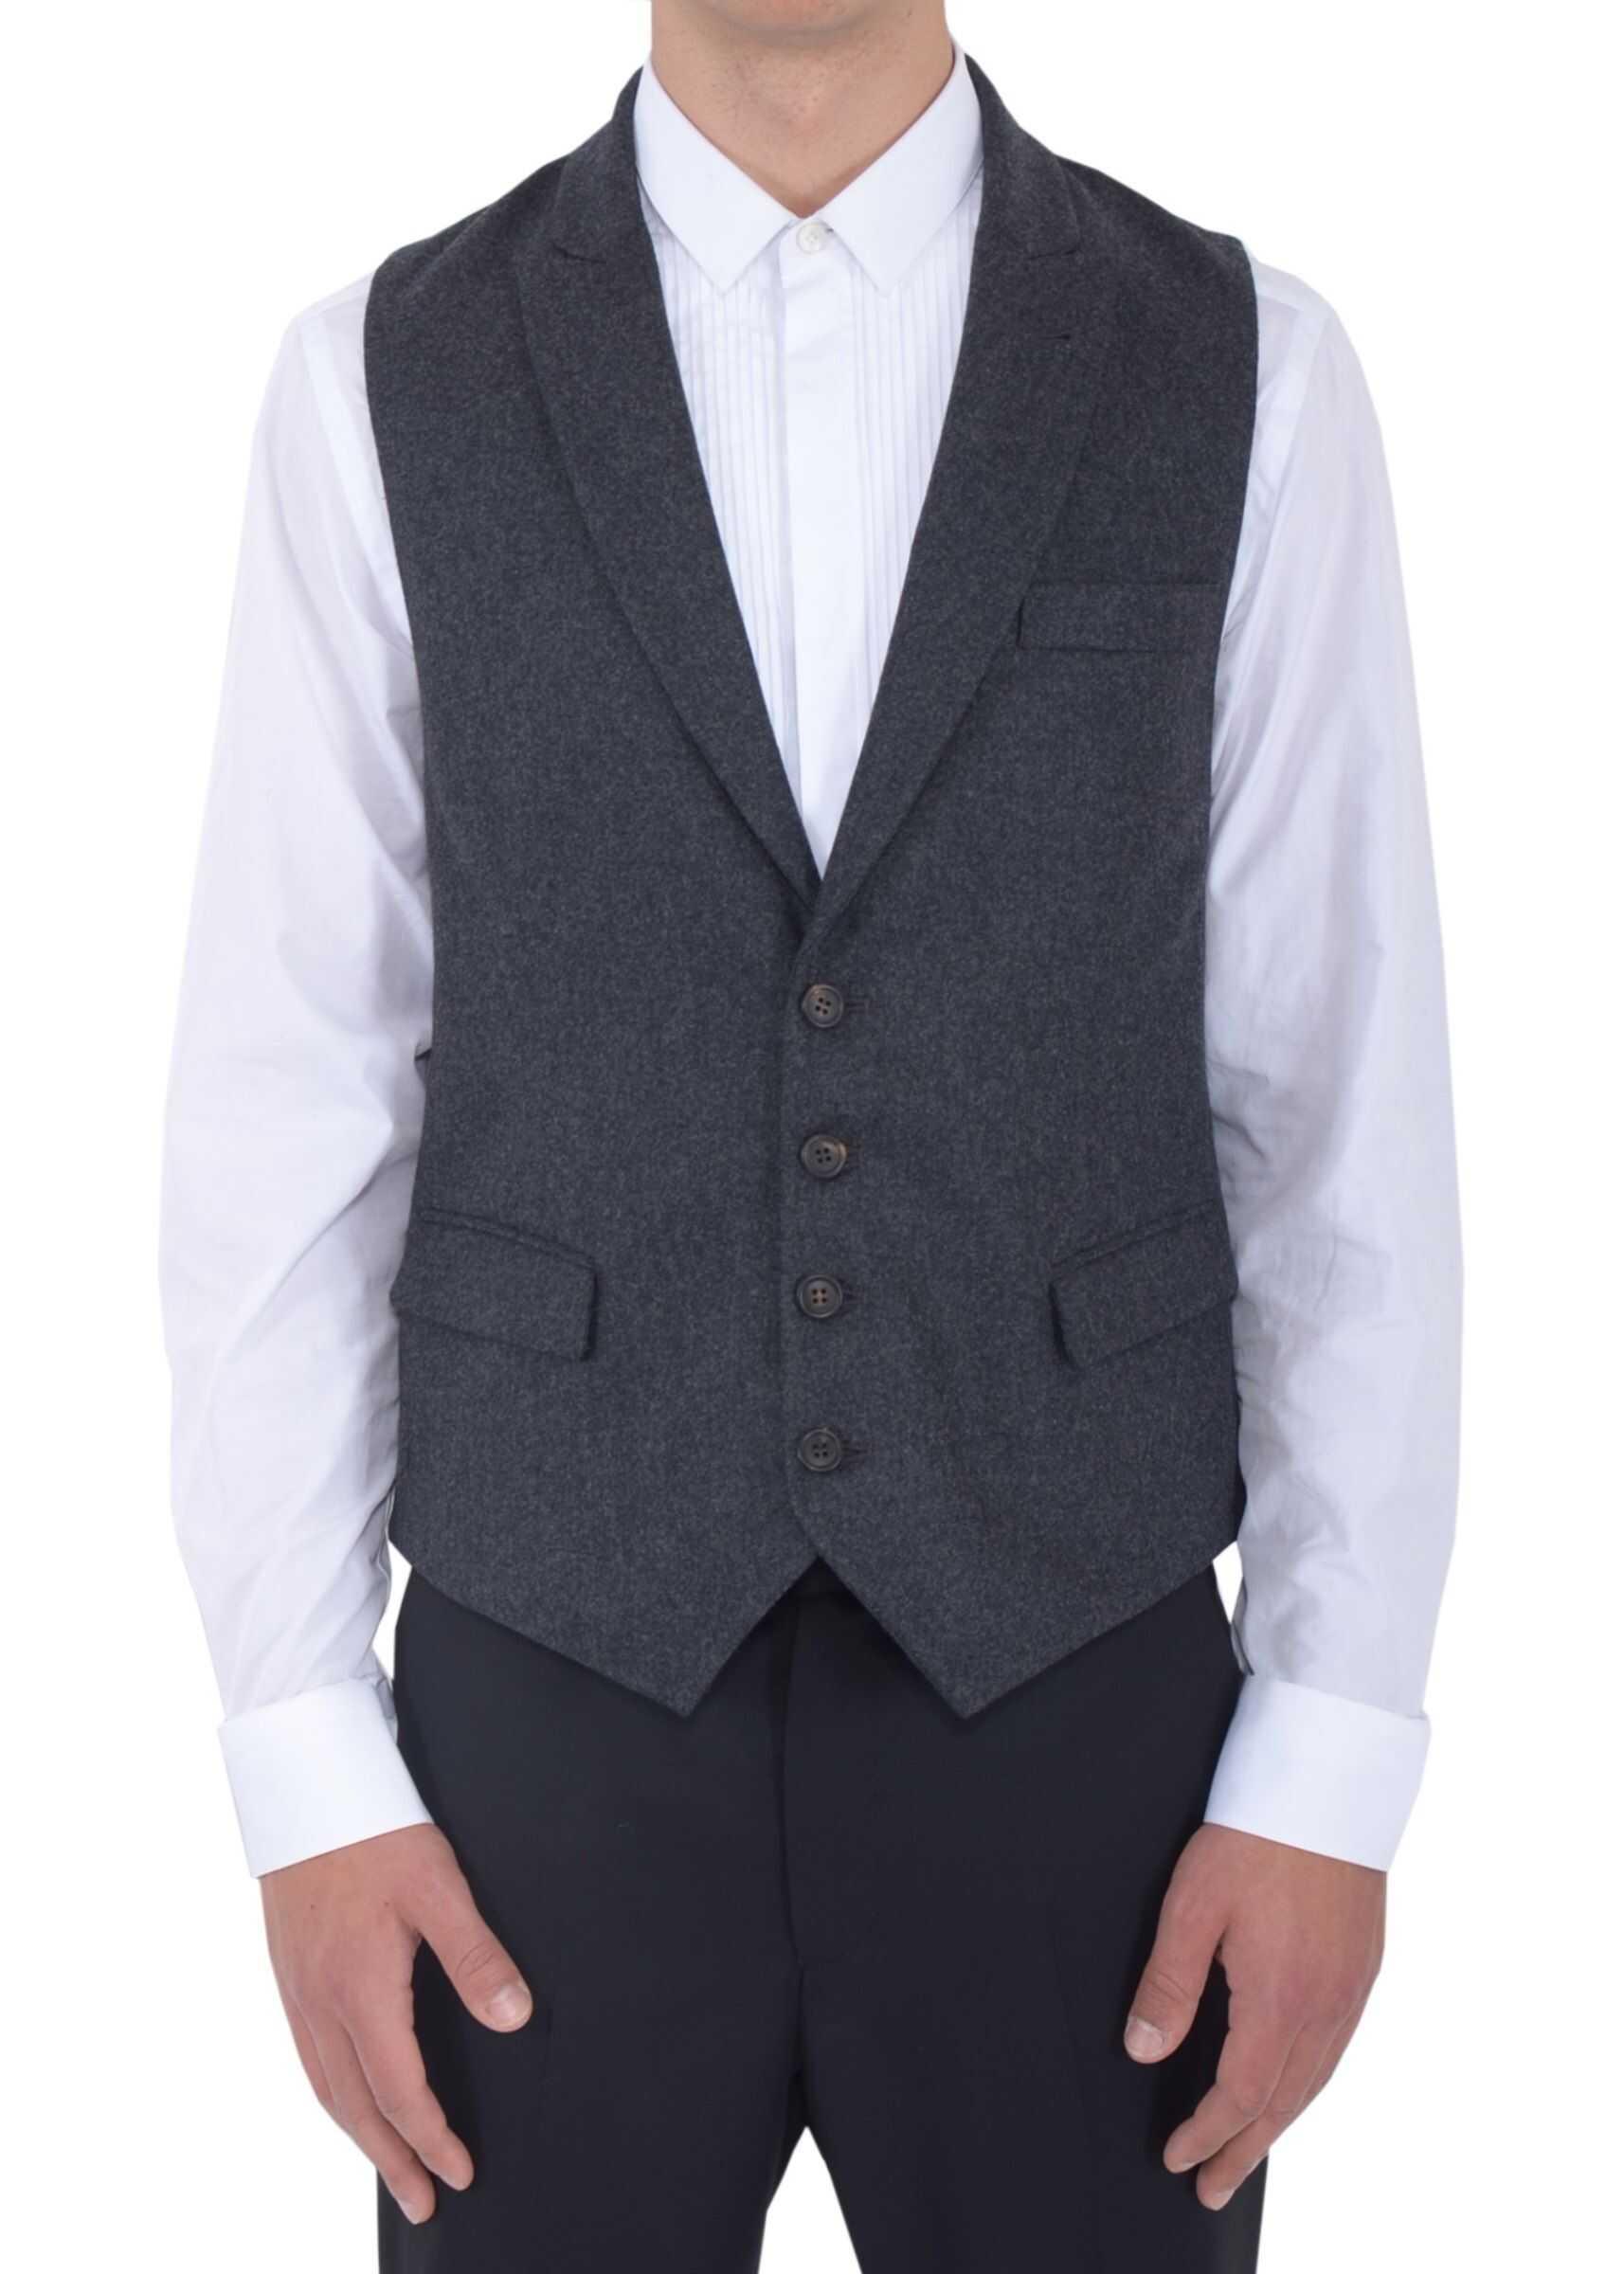 Brunello Cucinelli Classic Waistcoat GREY imagine